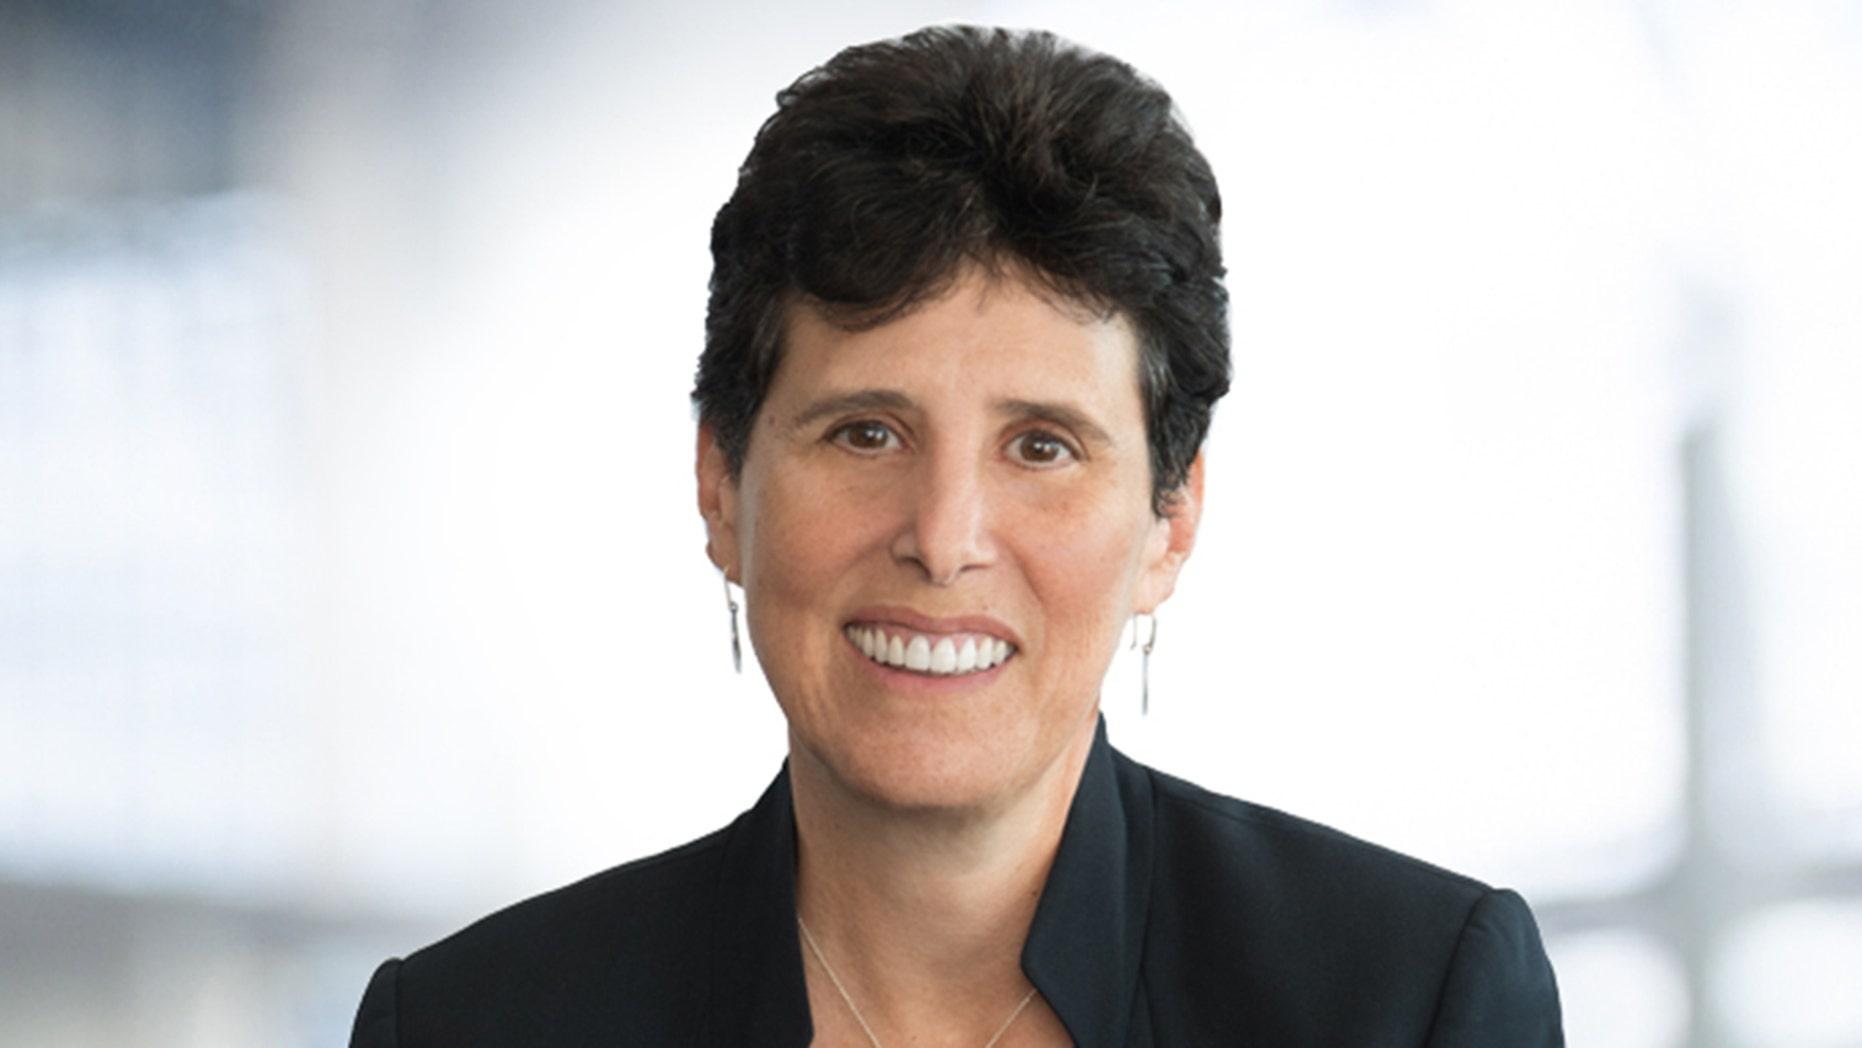 Attorney Debra Katz is representing Brett Kavanaugh accuser Christine Ford.